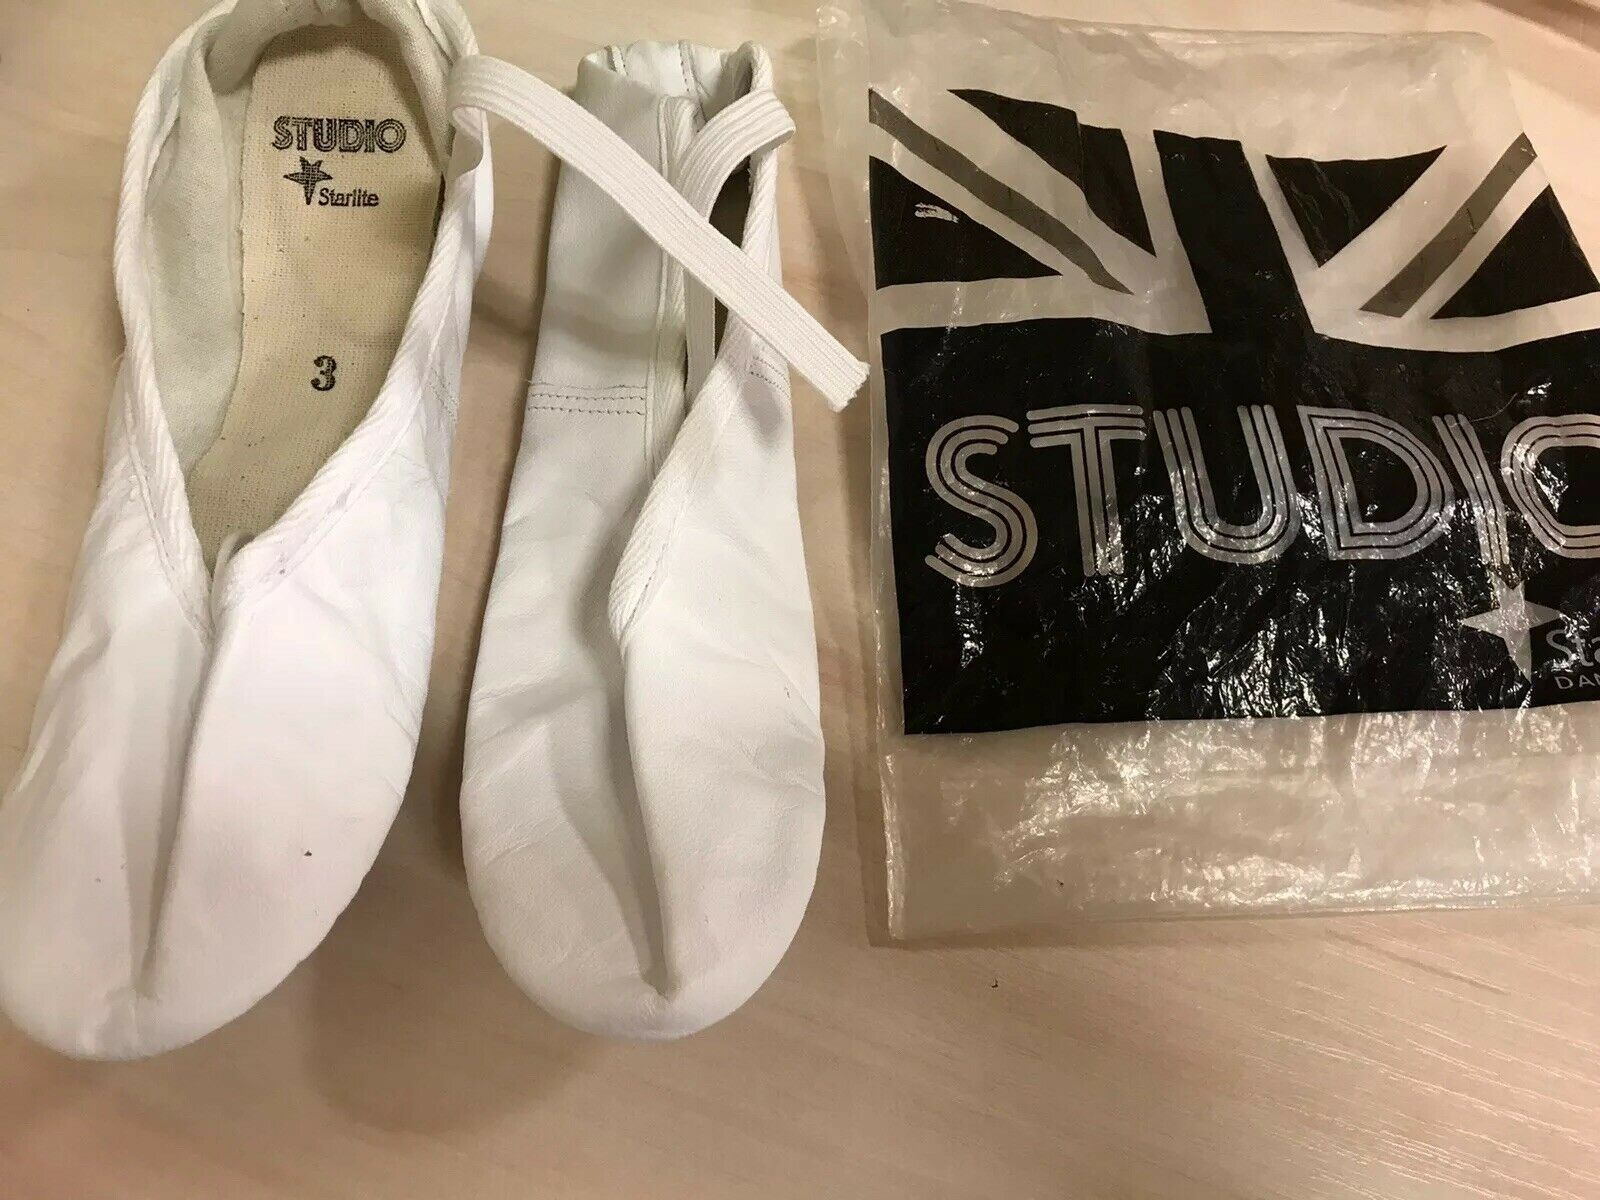 Starlite Studio Full Sole White Leather Ballet Shoes Size 3